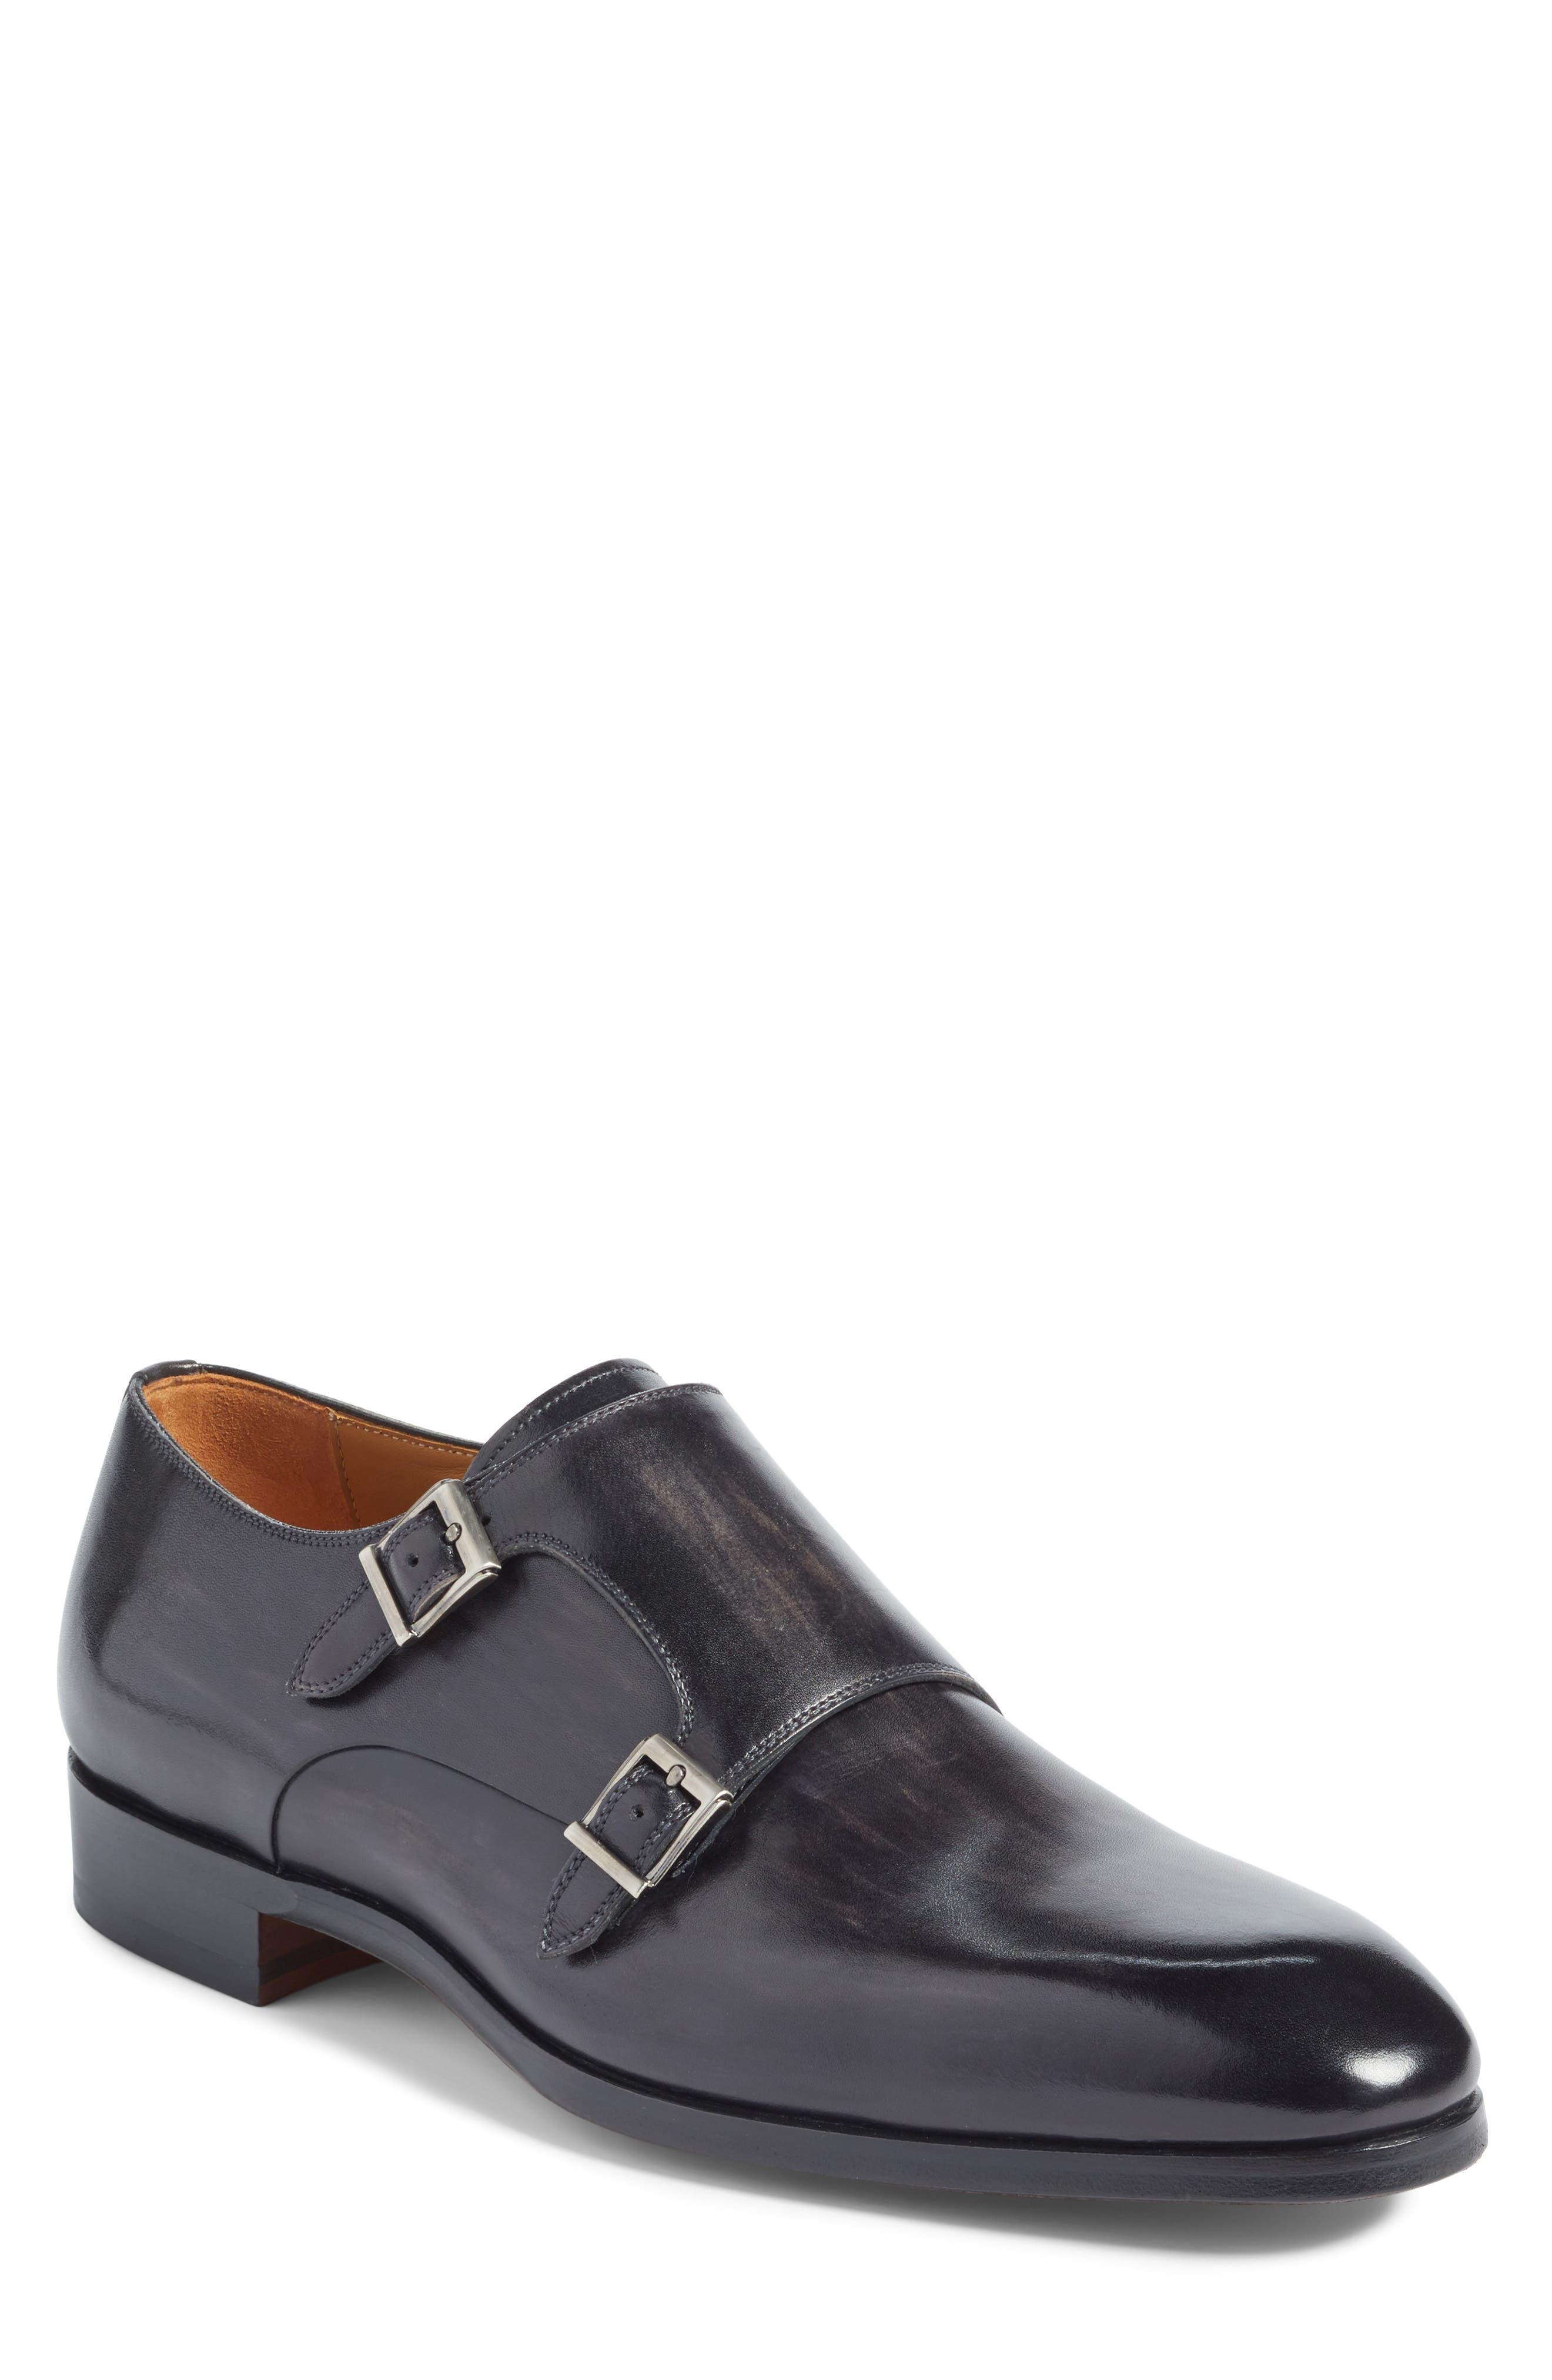 Magnanni Men's Lucio Double Strap Monk Shoe 6dEqrnVF